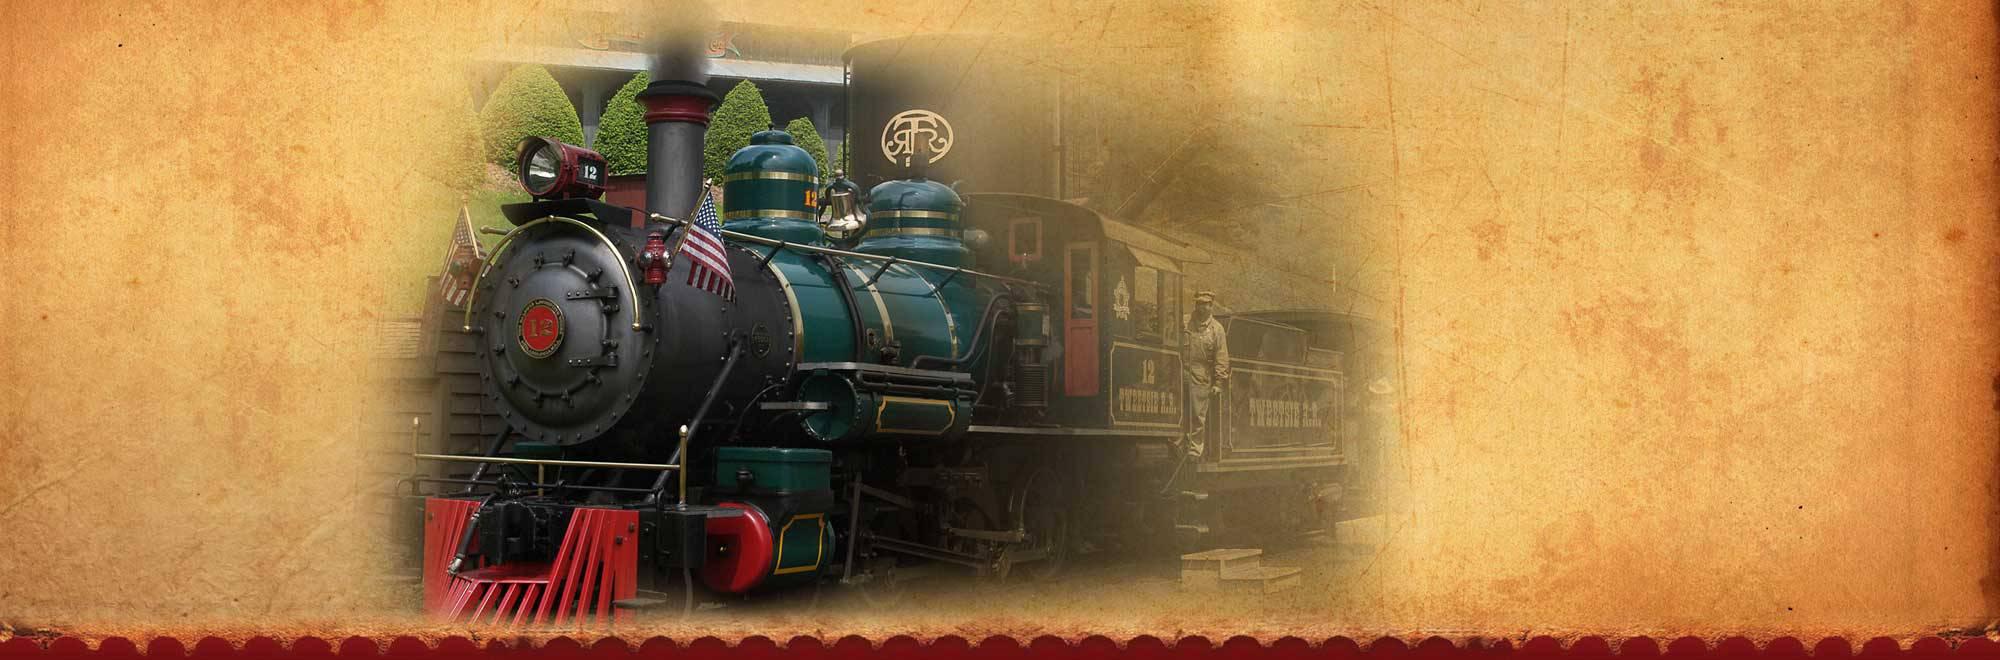 Wild West Theme Park Advenure Slide Background